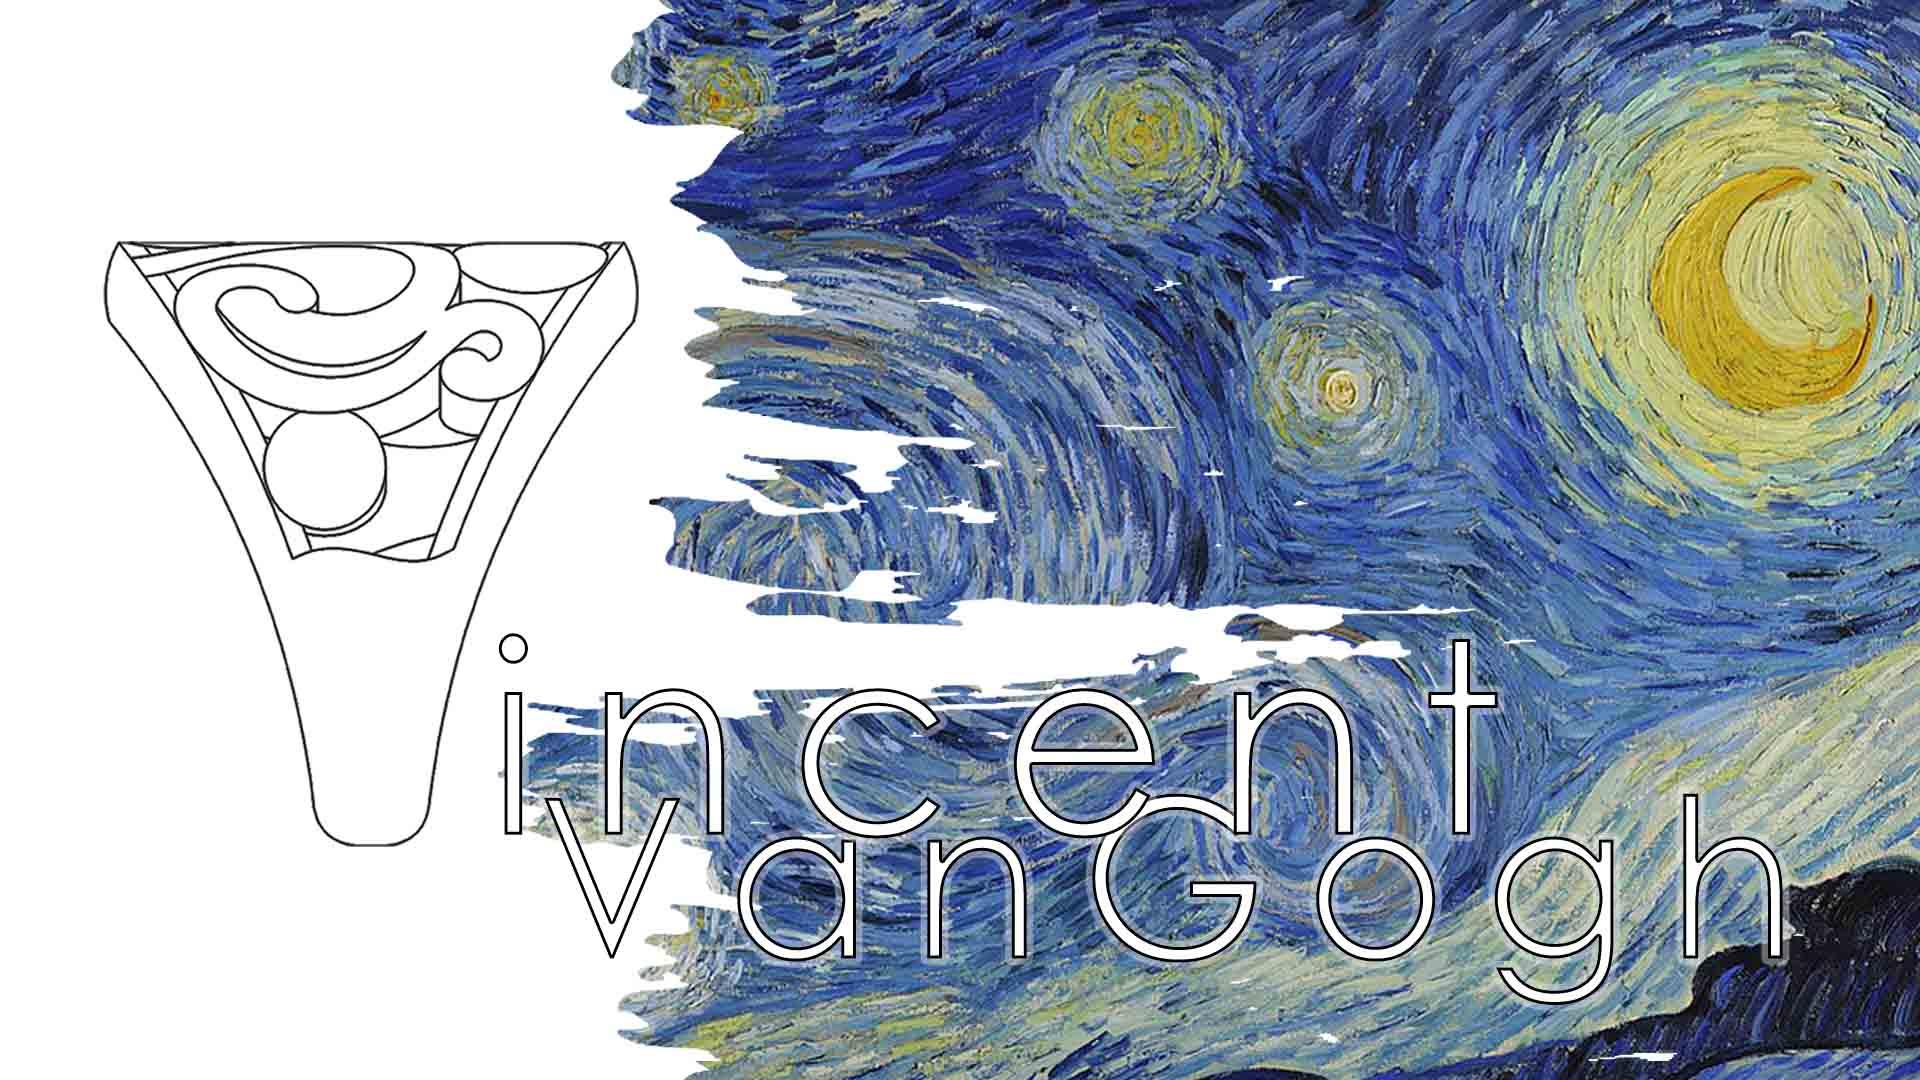 Anelli bozzetto Notte Stellata Van Gogh - Maddalena Germano Blog